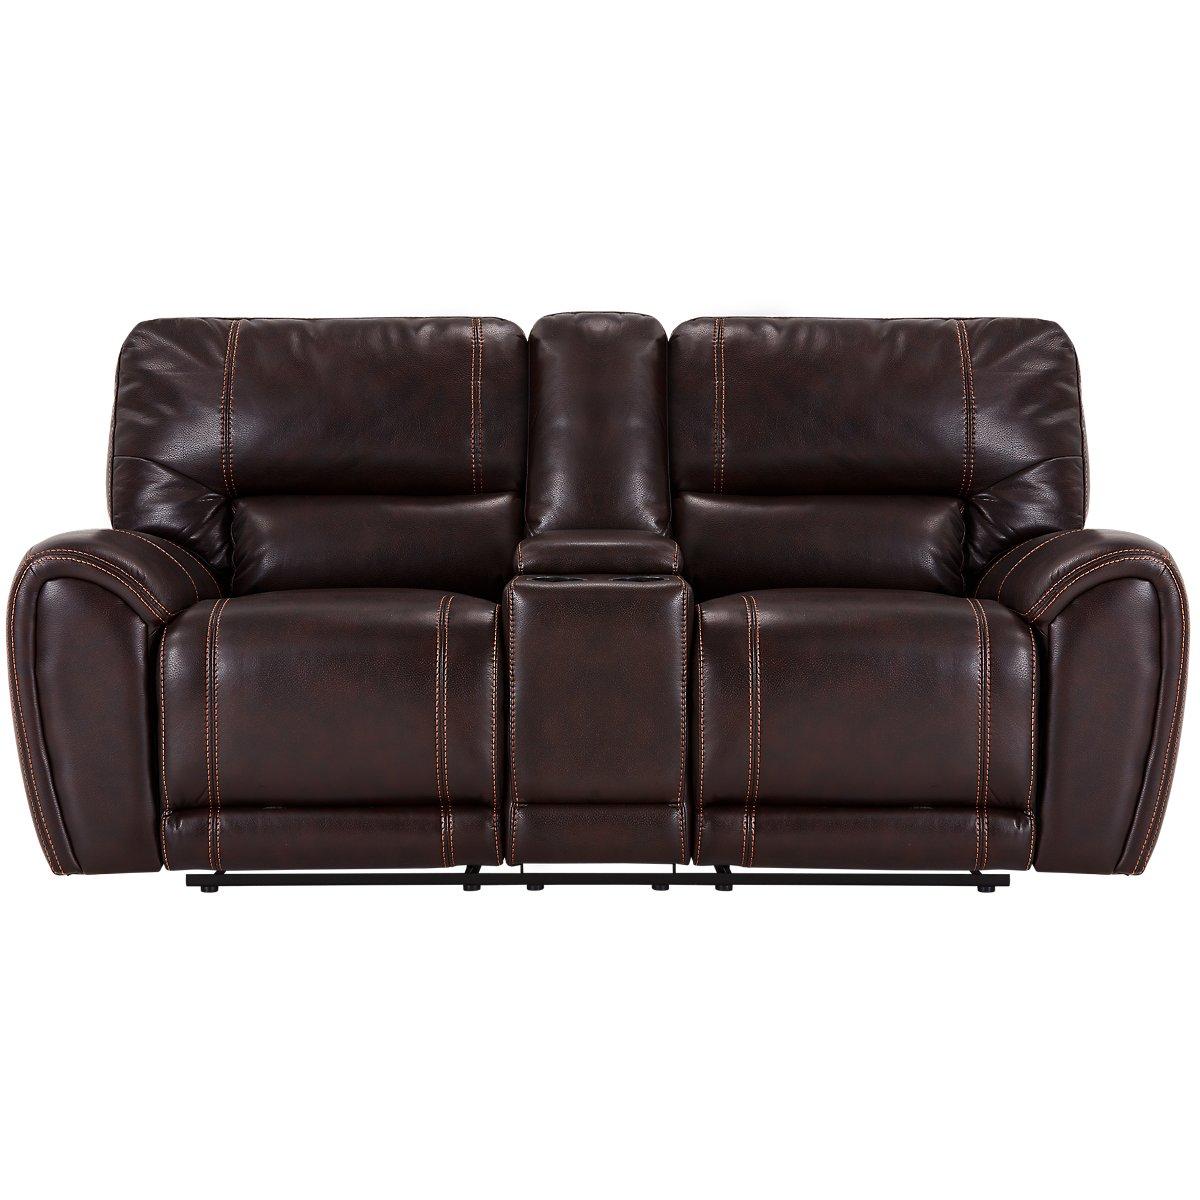 City Furniture Bailey Dark Brown Microfiber Power